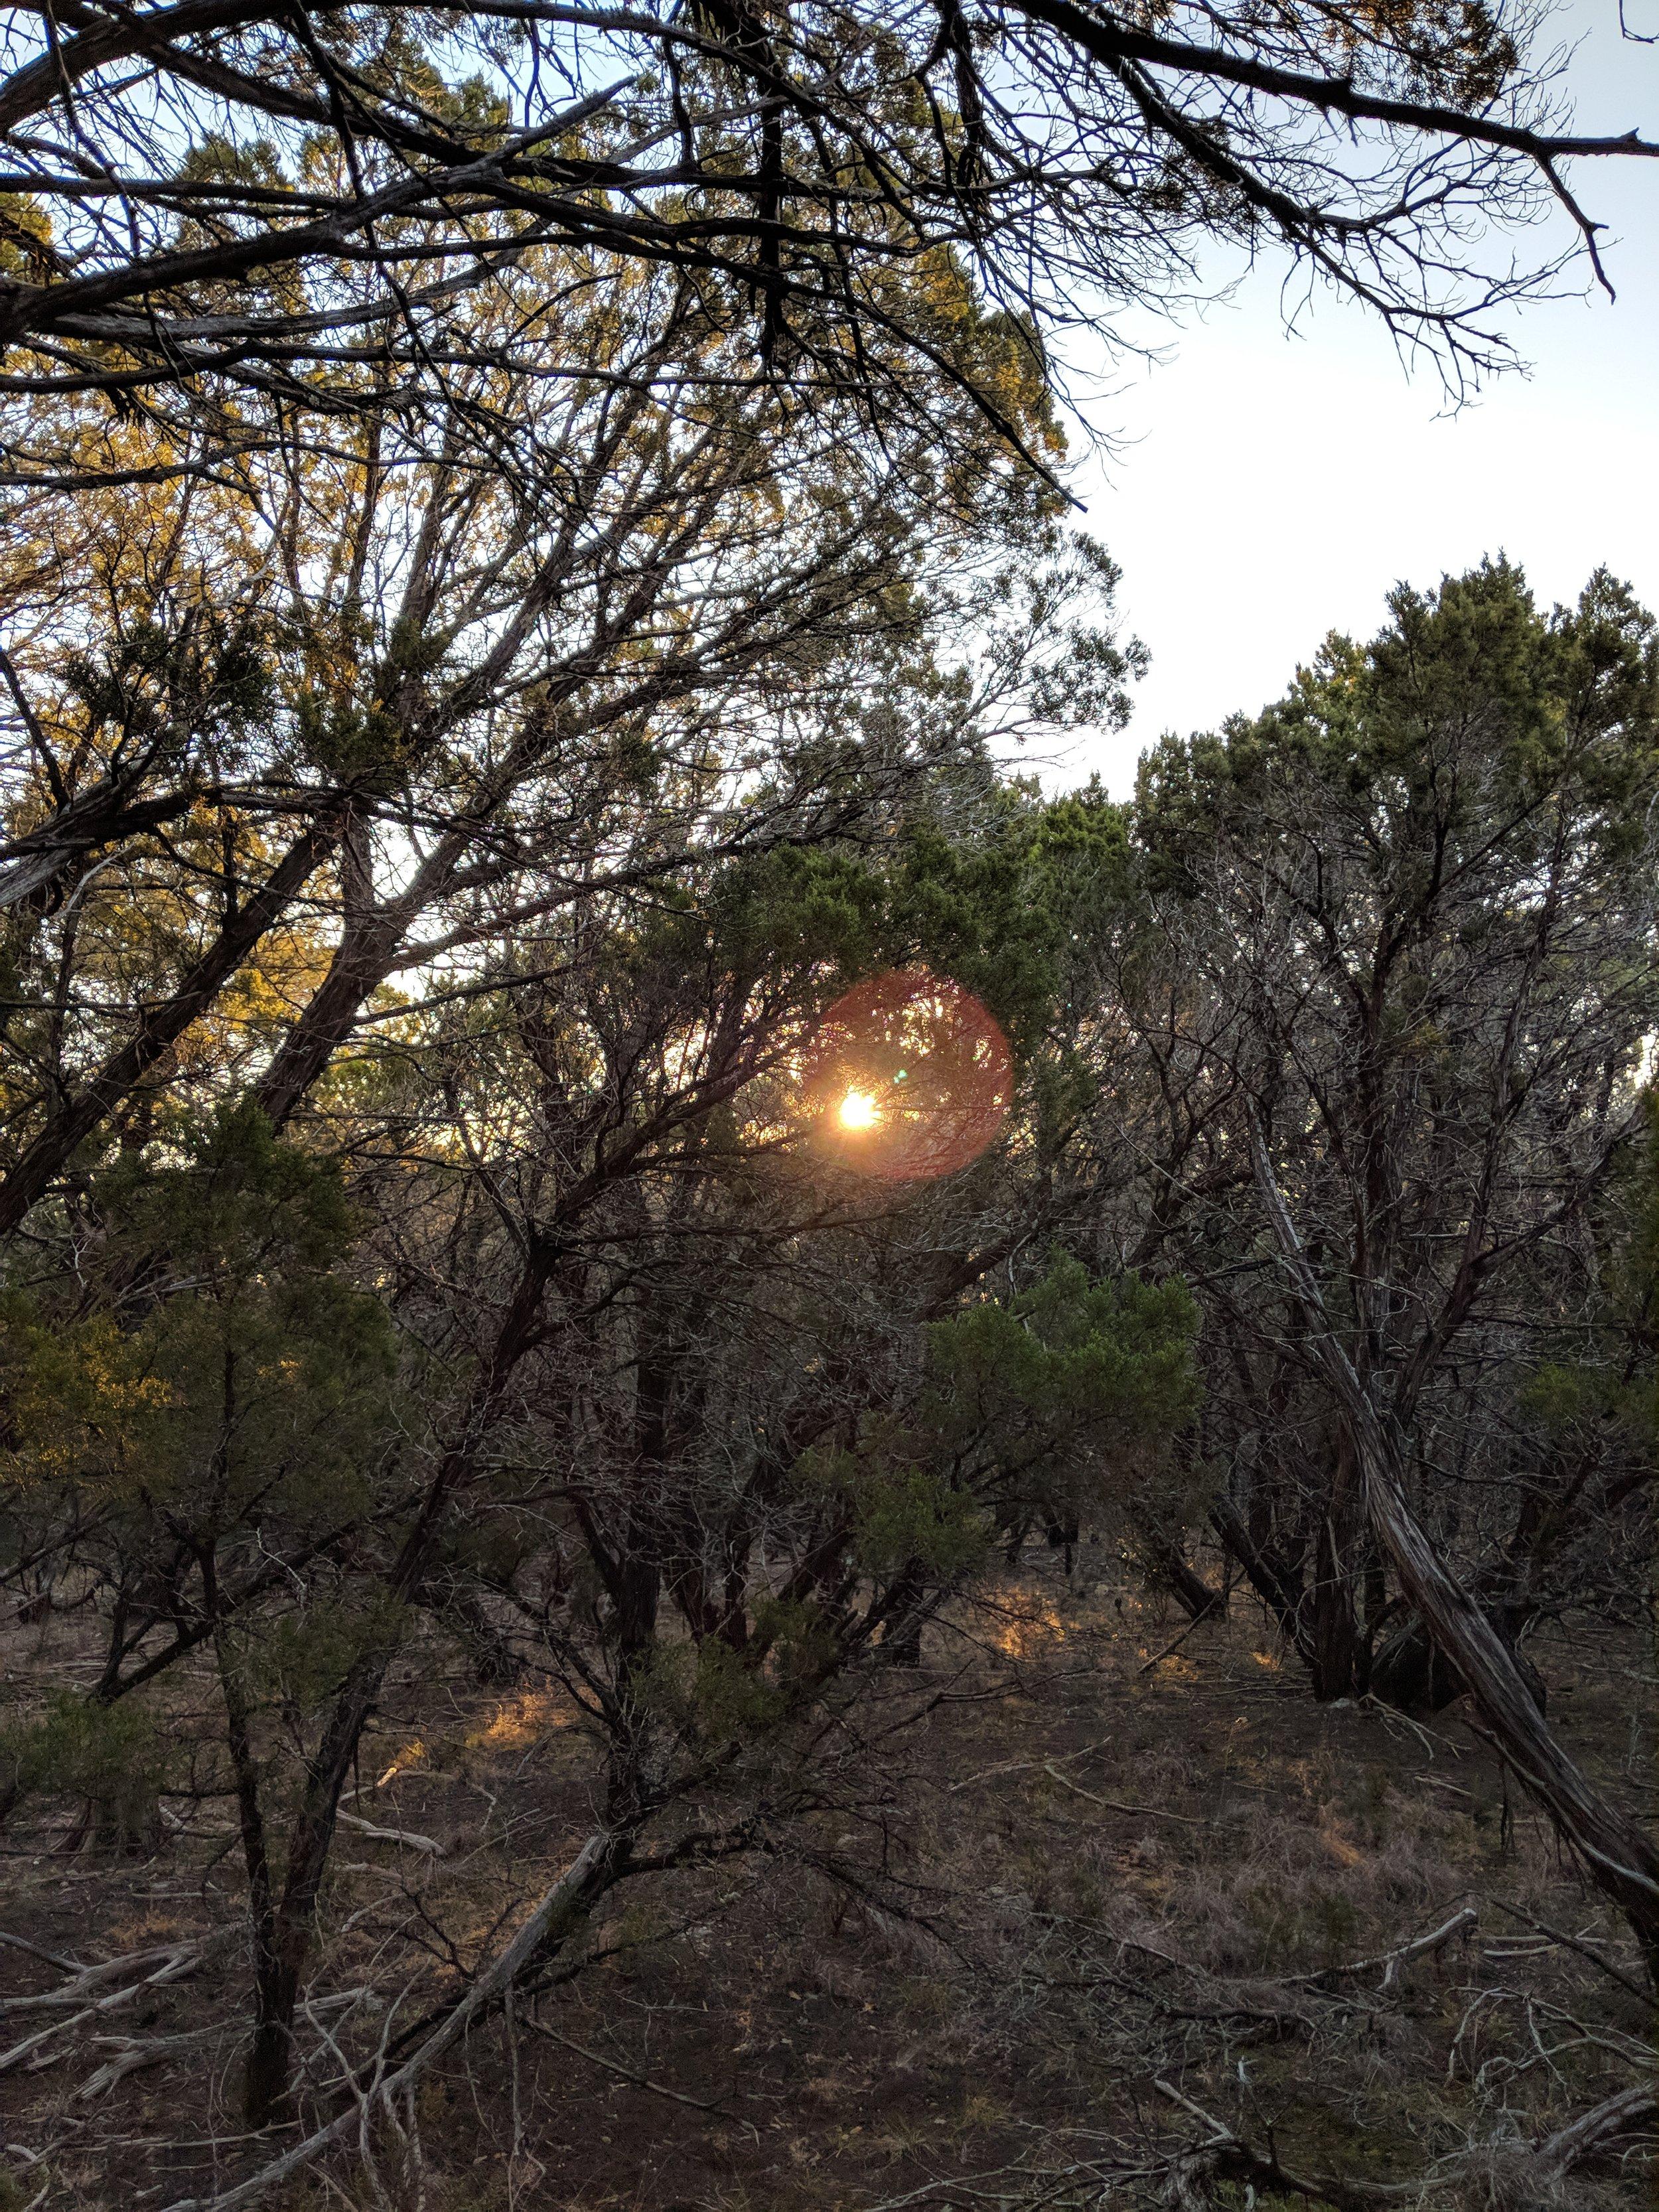 Found the Sun